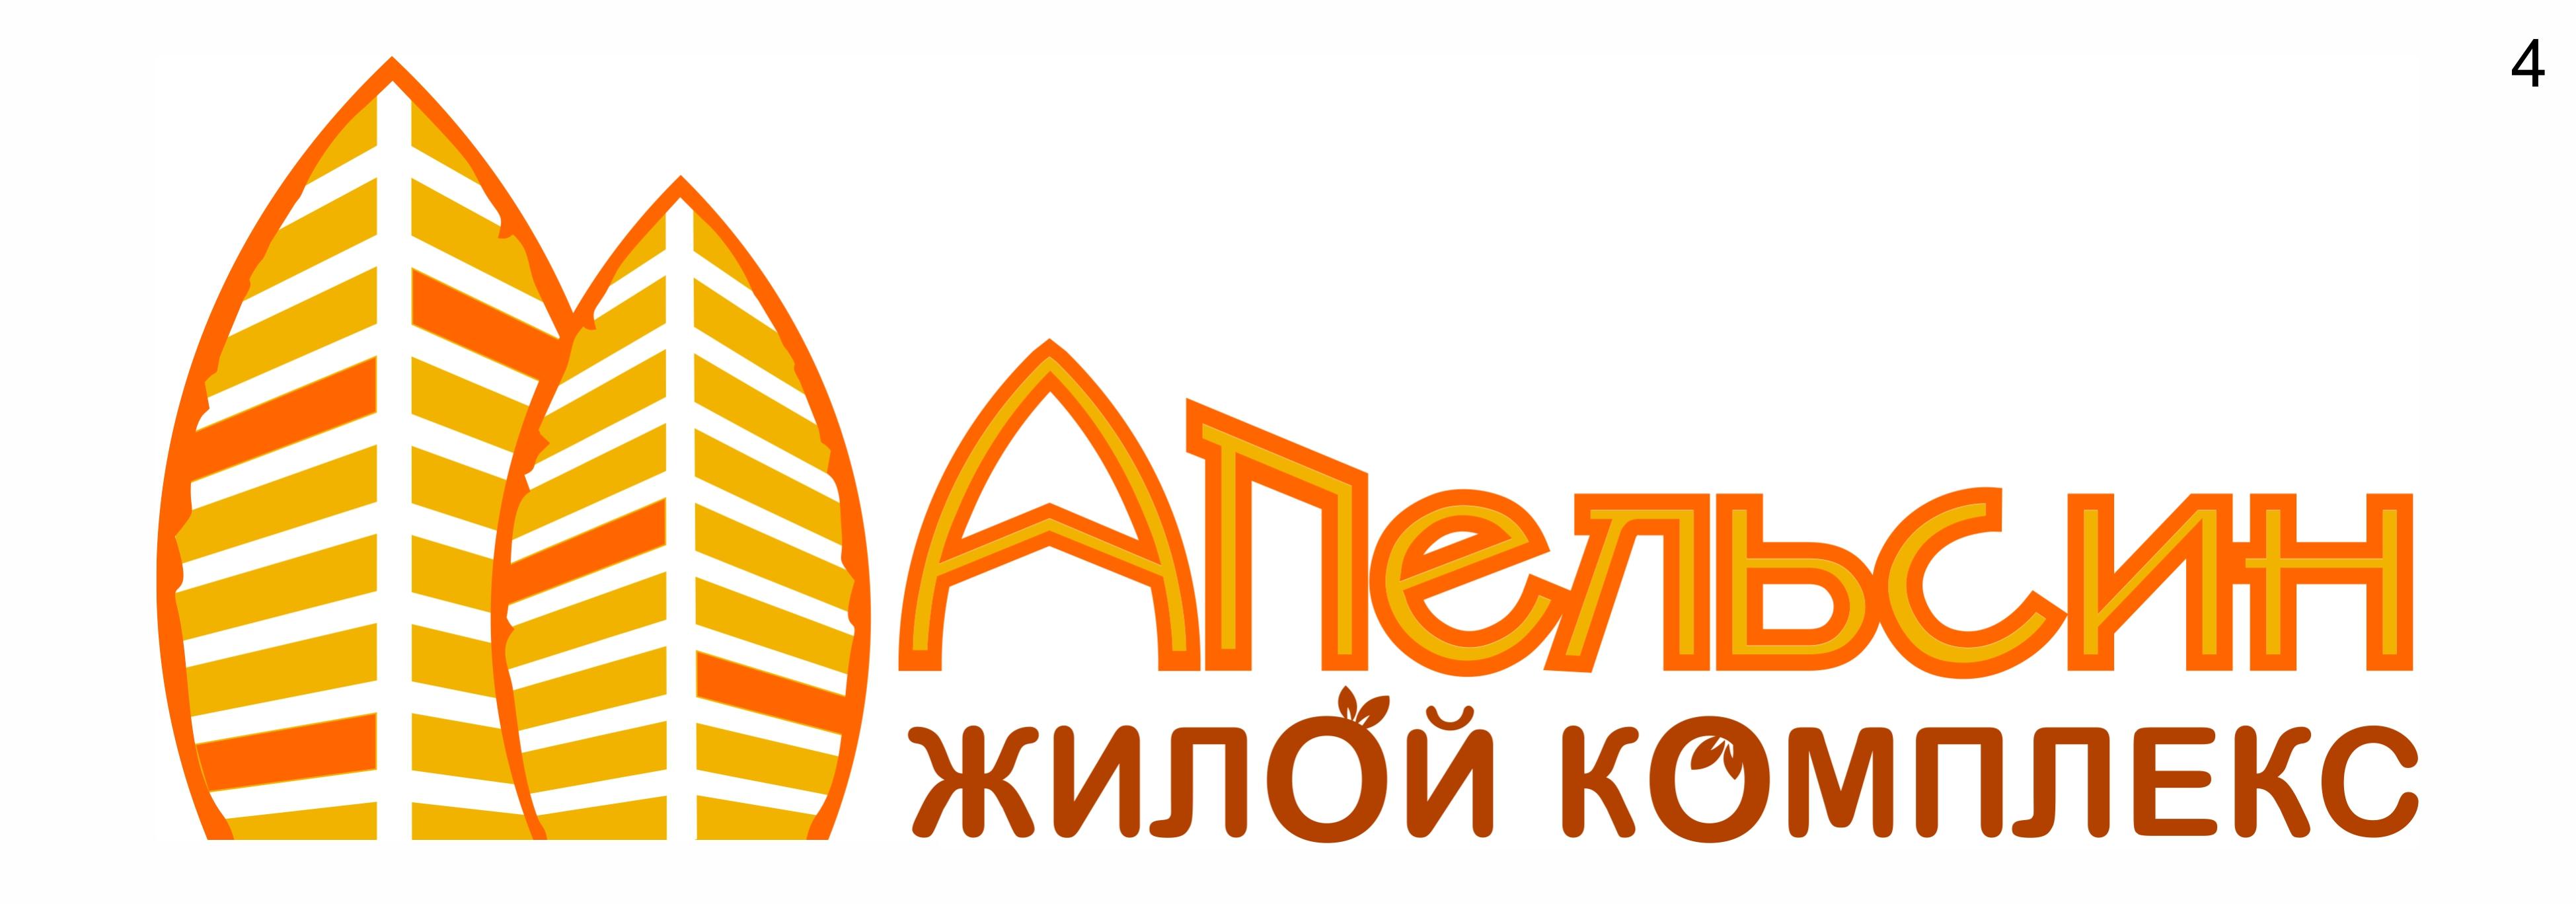 Логотип и фирменный стиль фото f_7025a6714ee2d406.jpg